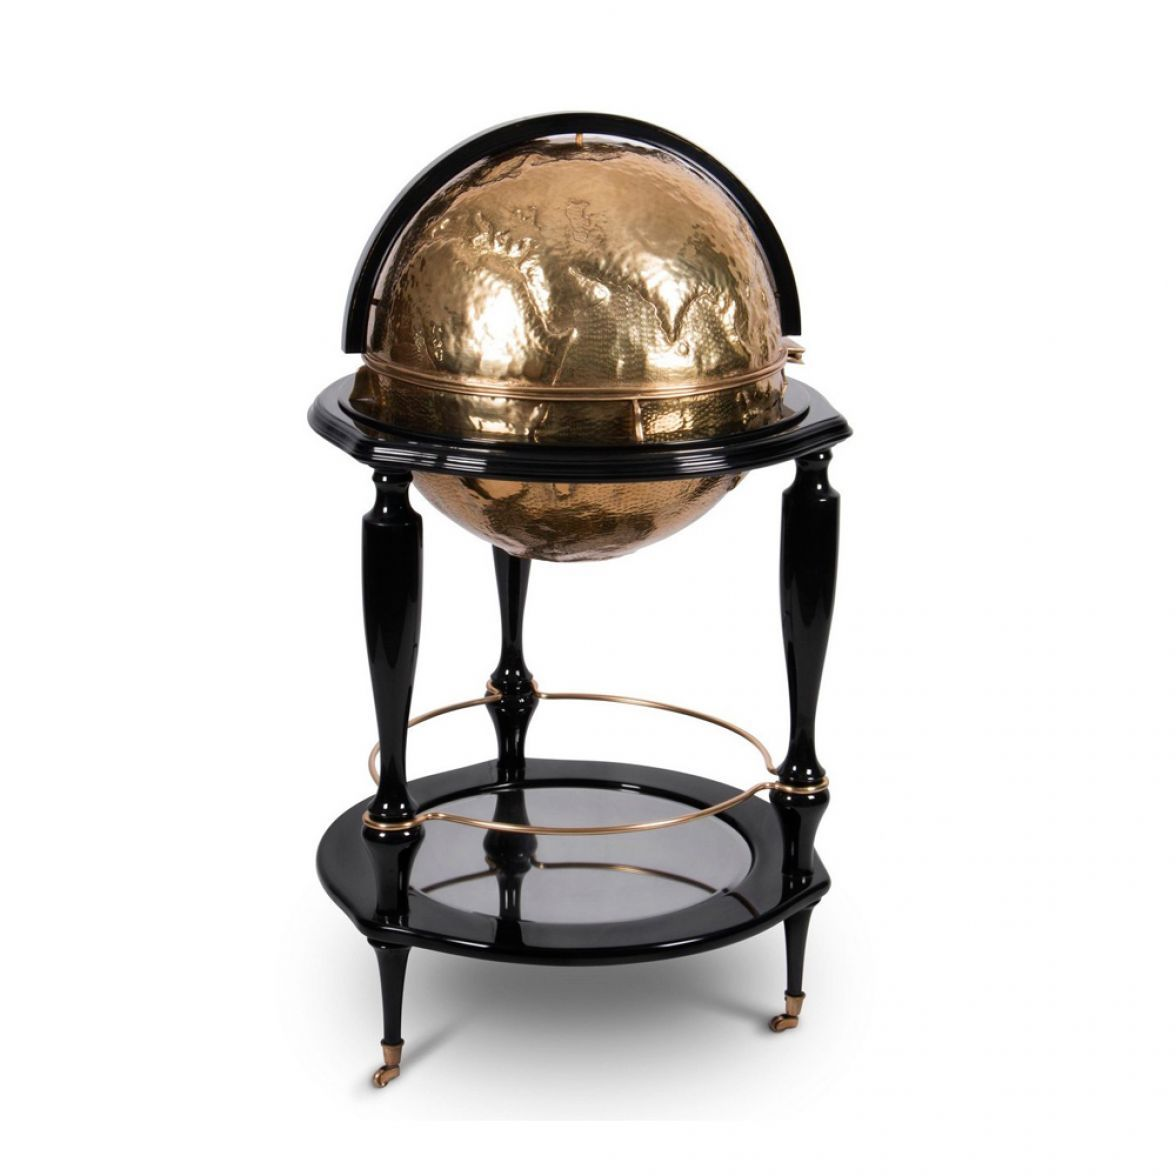 Equator Globe bar